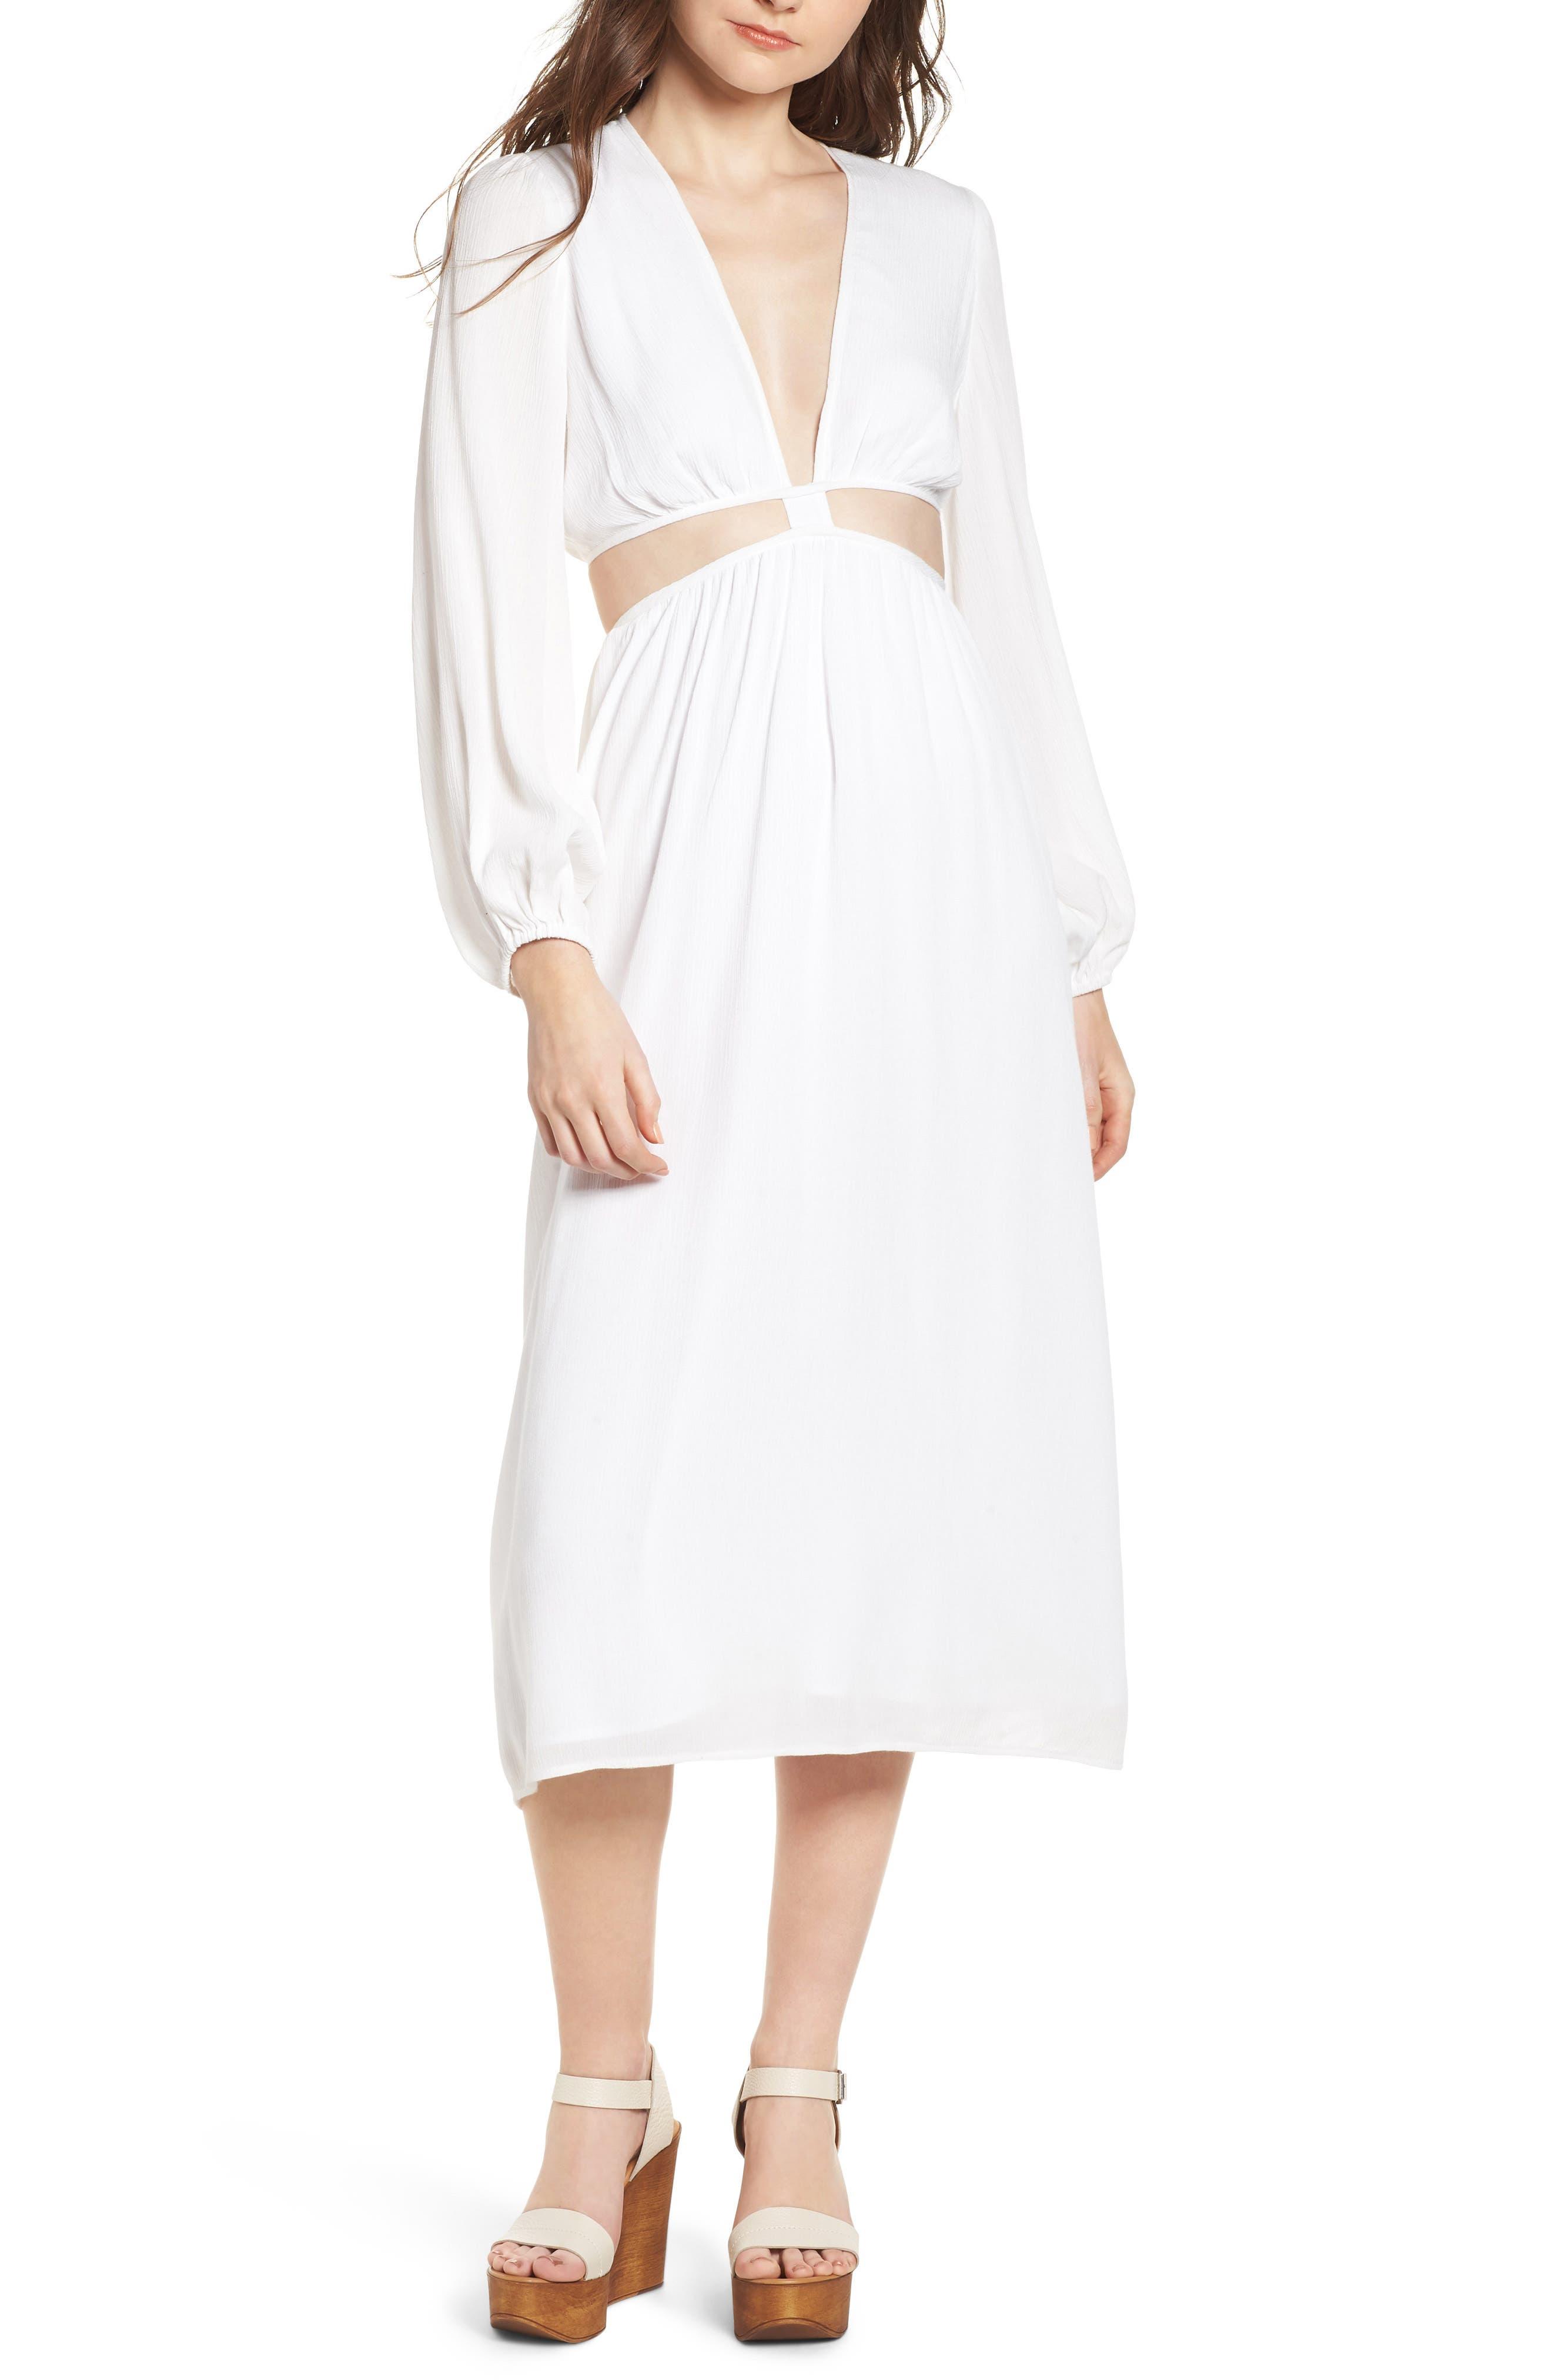 Babylon Cutout Dress,                             Main thumbnail 1, color,                             Ivory